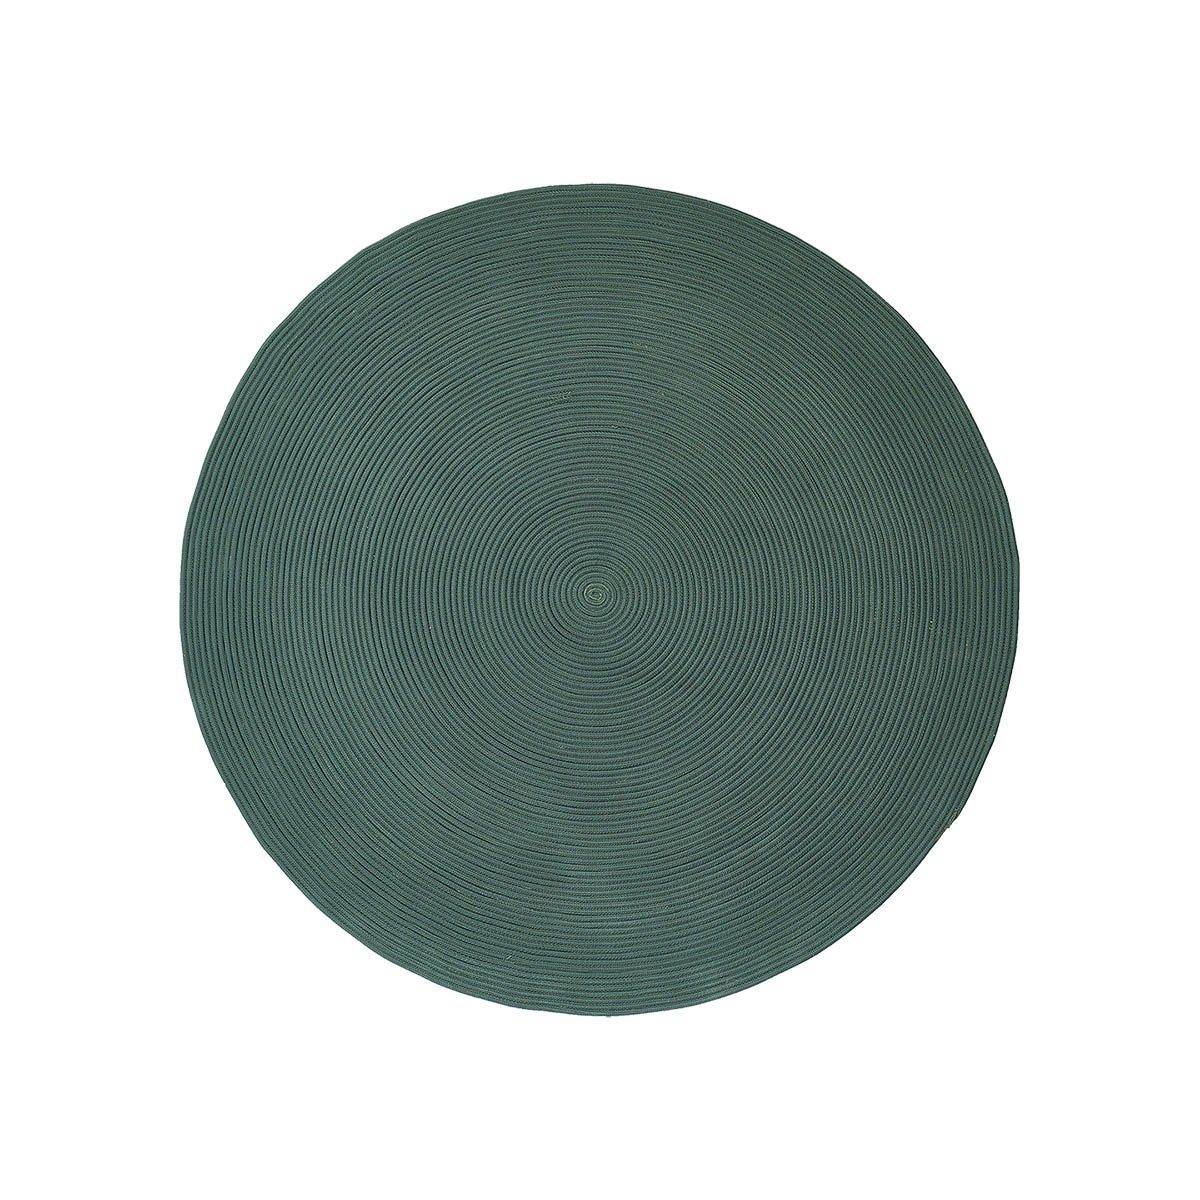 Mattan Infinity i grön polypropylen i färgen grön.